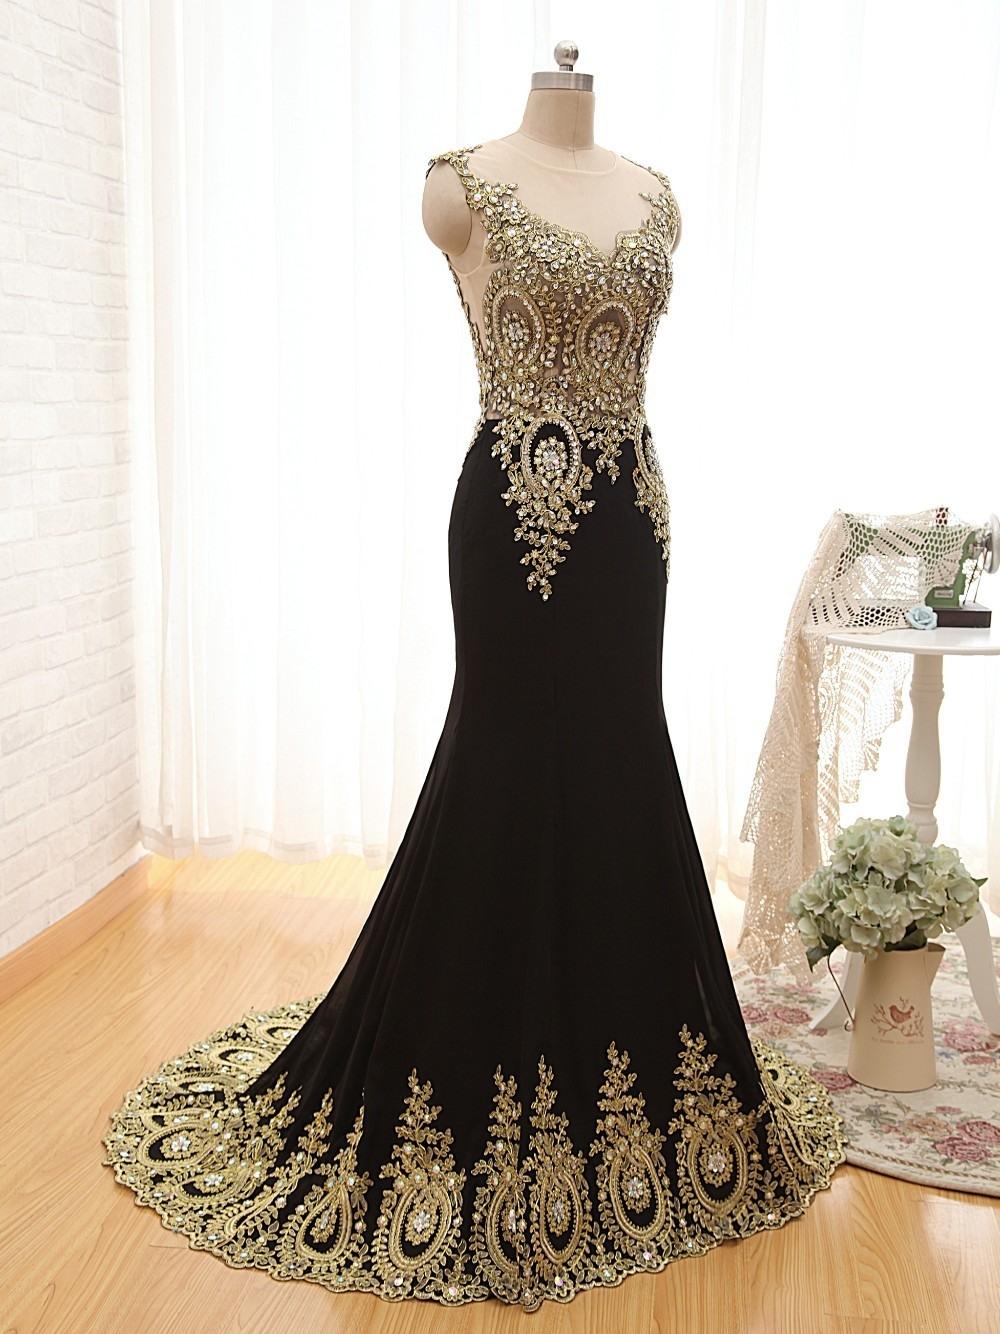 15 Coolste Abendkleid Schwarz Gold Lang Boutique Cool Abendkleid Schwarz Gold Lang für 2019